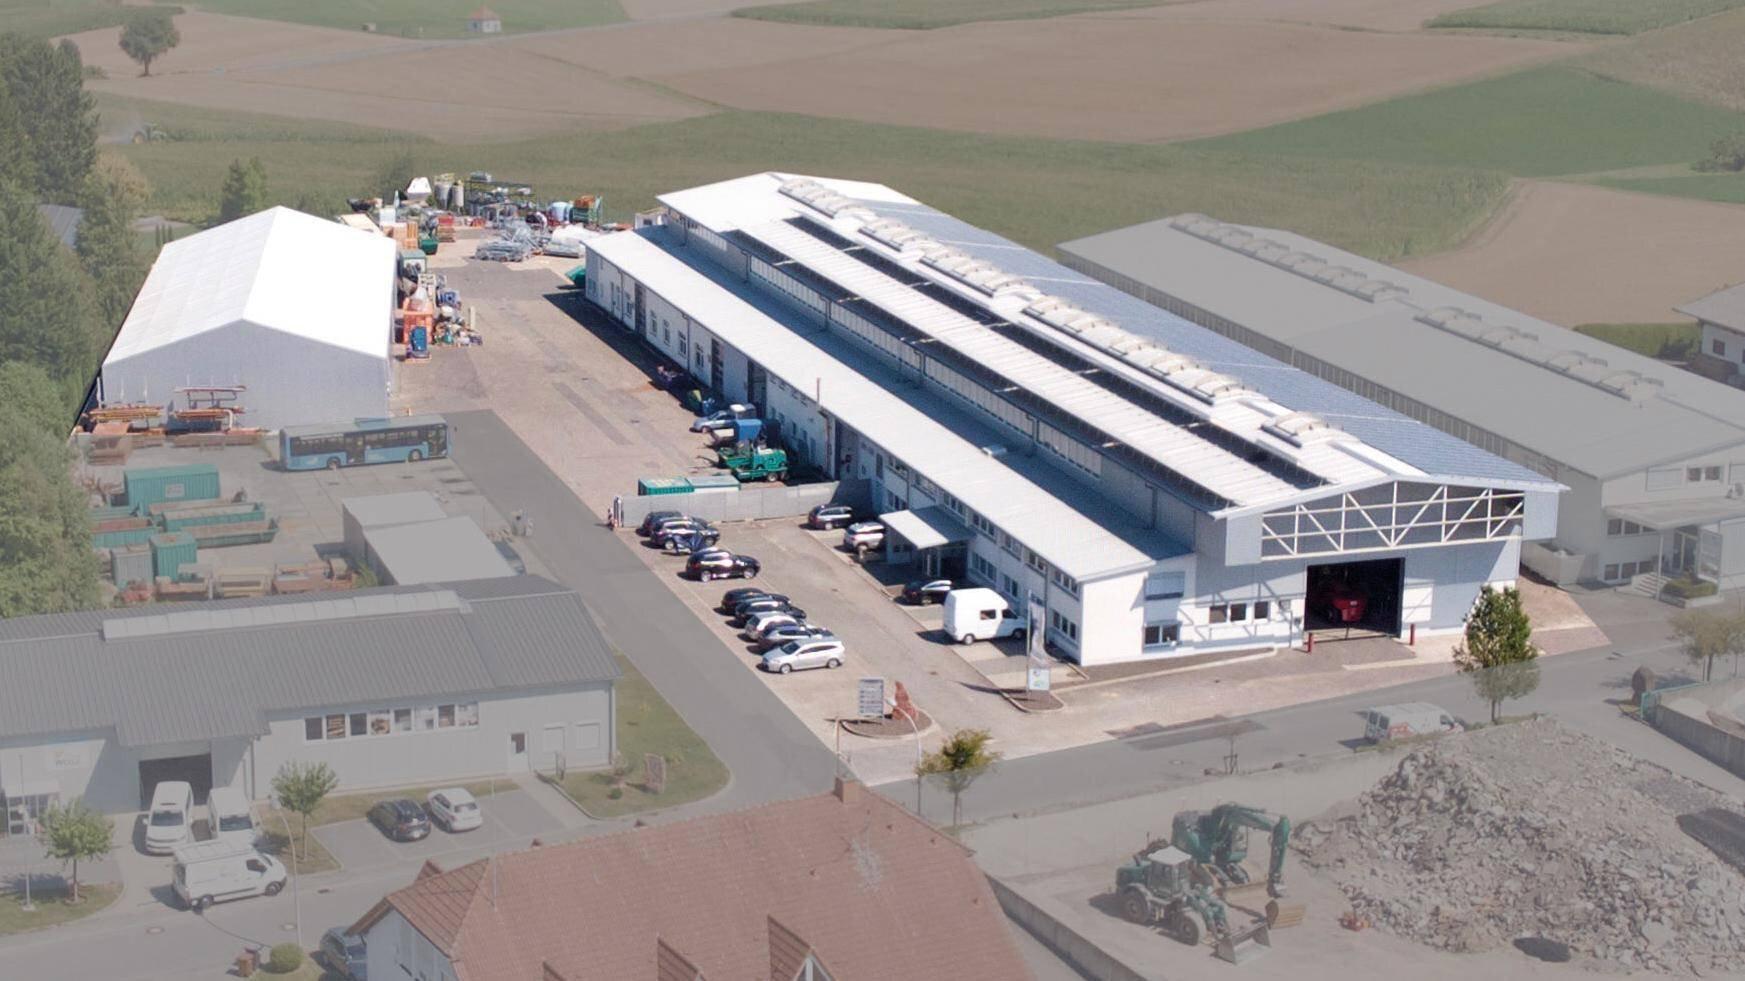 Gallery image 1 - Plant 2 in Reichartshausen 2000m² production area